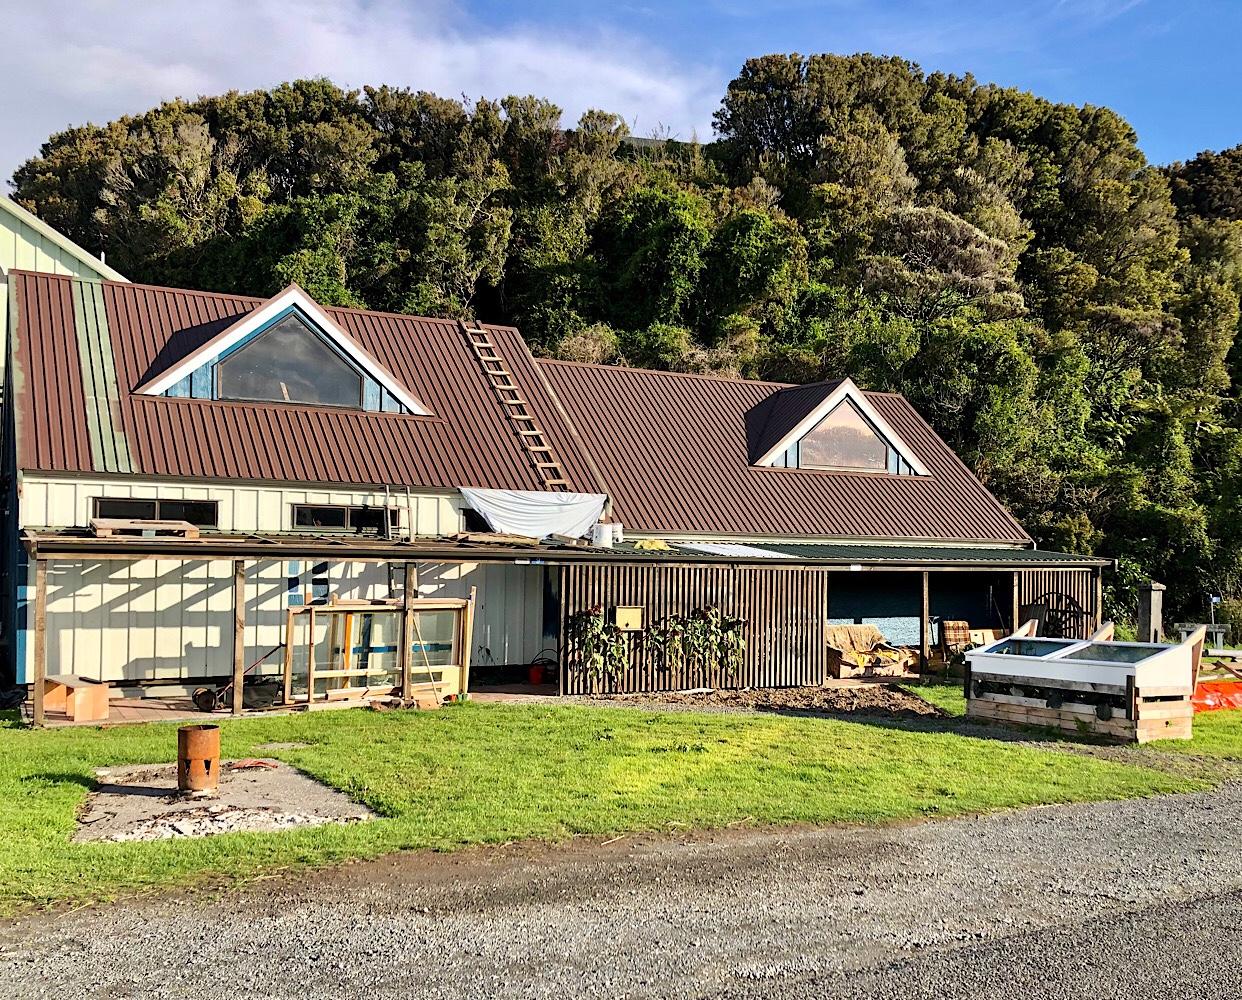 Old museum Stewart Island March 2021